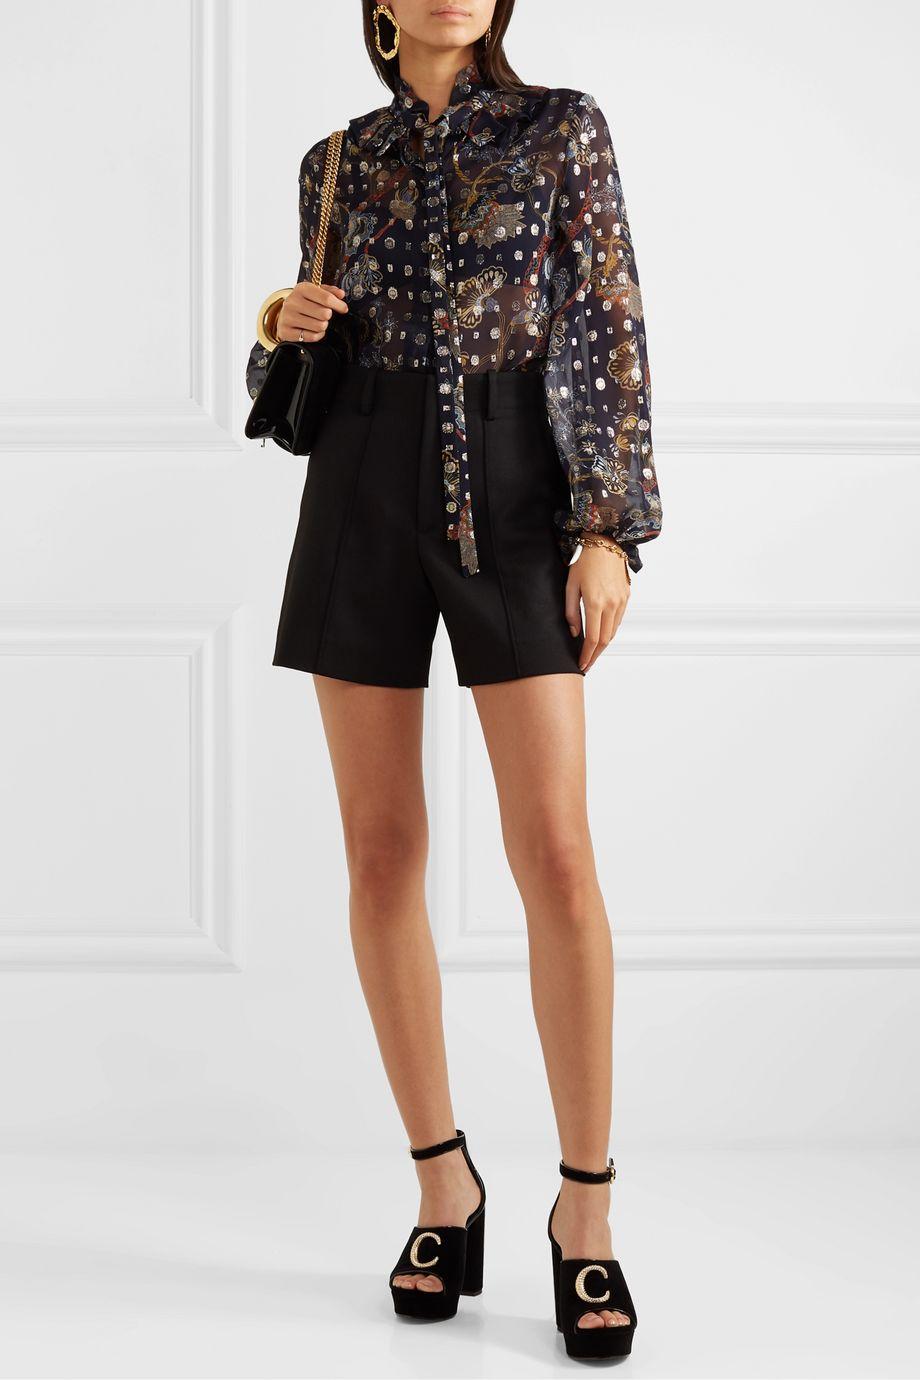 Chloé Ruffled pussy-bow printed fil coupé silk-chiffon blouse